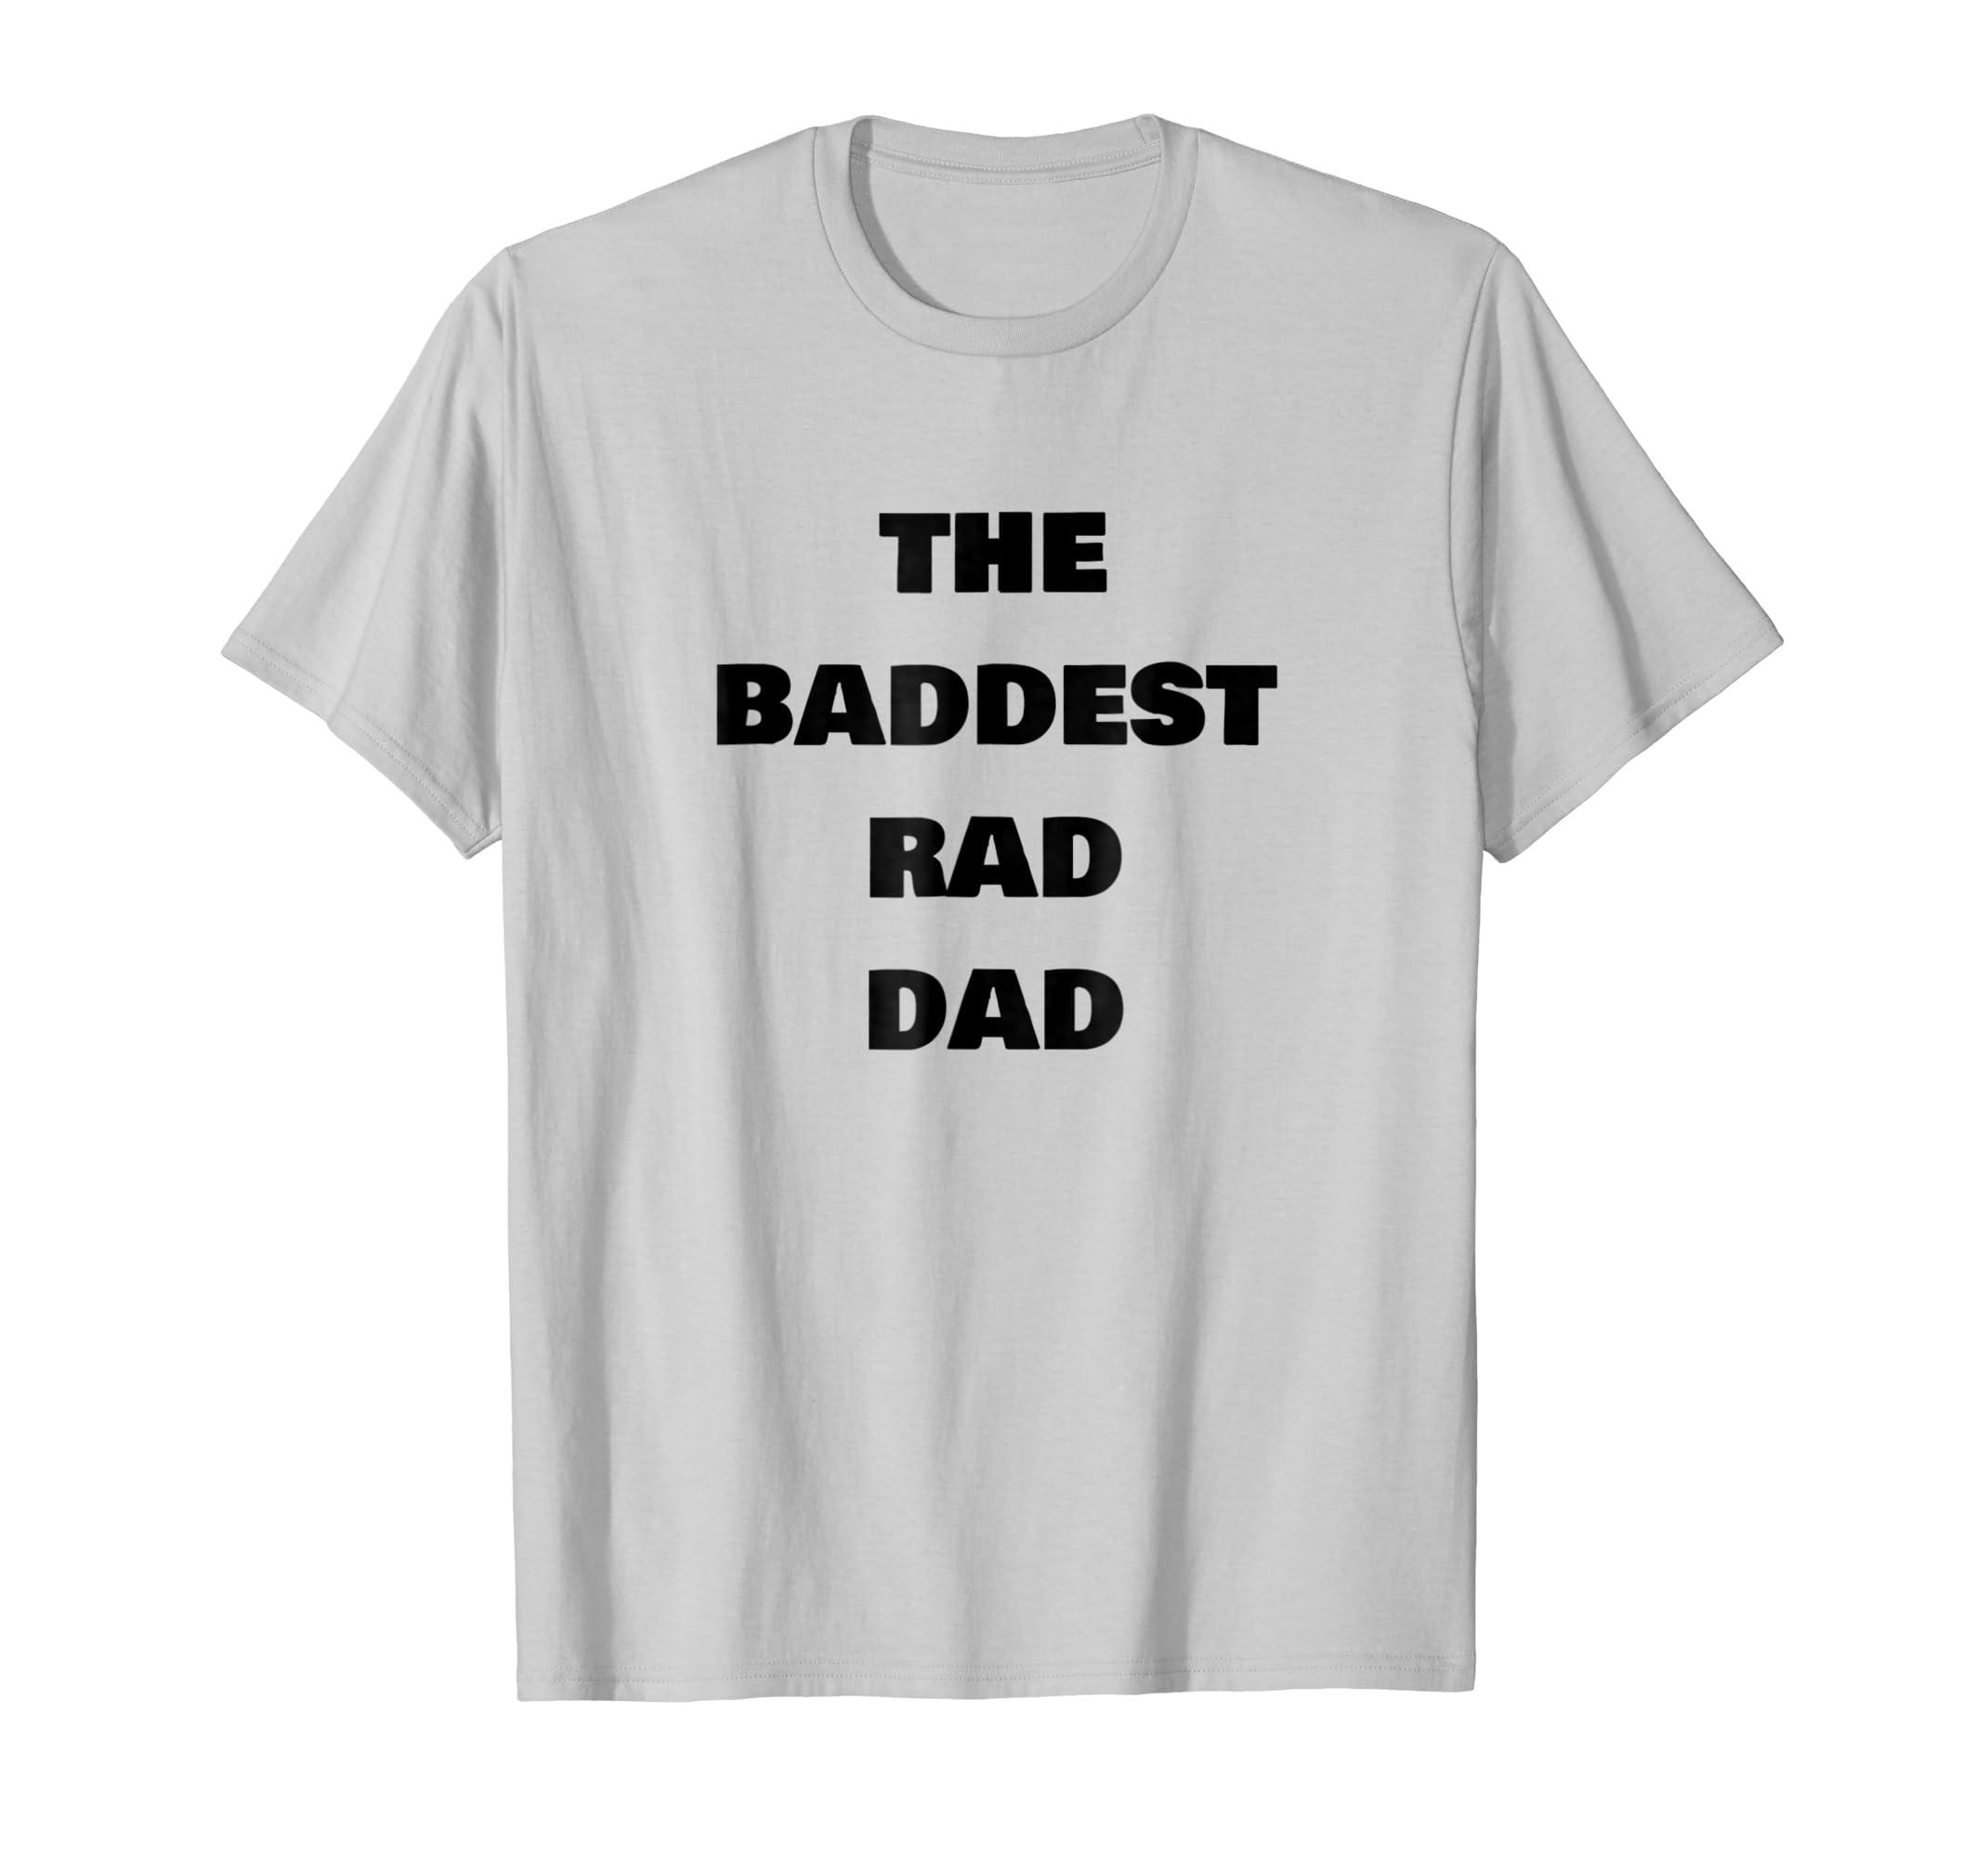 e16b5cae Amazon.com: Mens The Baddest Rad Dad T-Shirt Funny Graphic Tee: Clothing